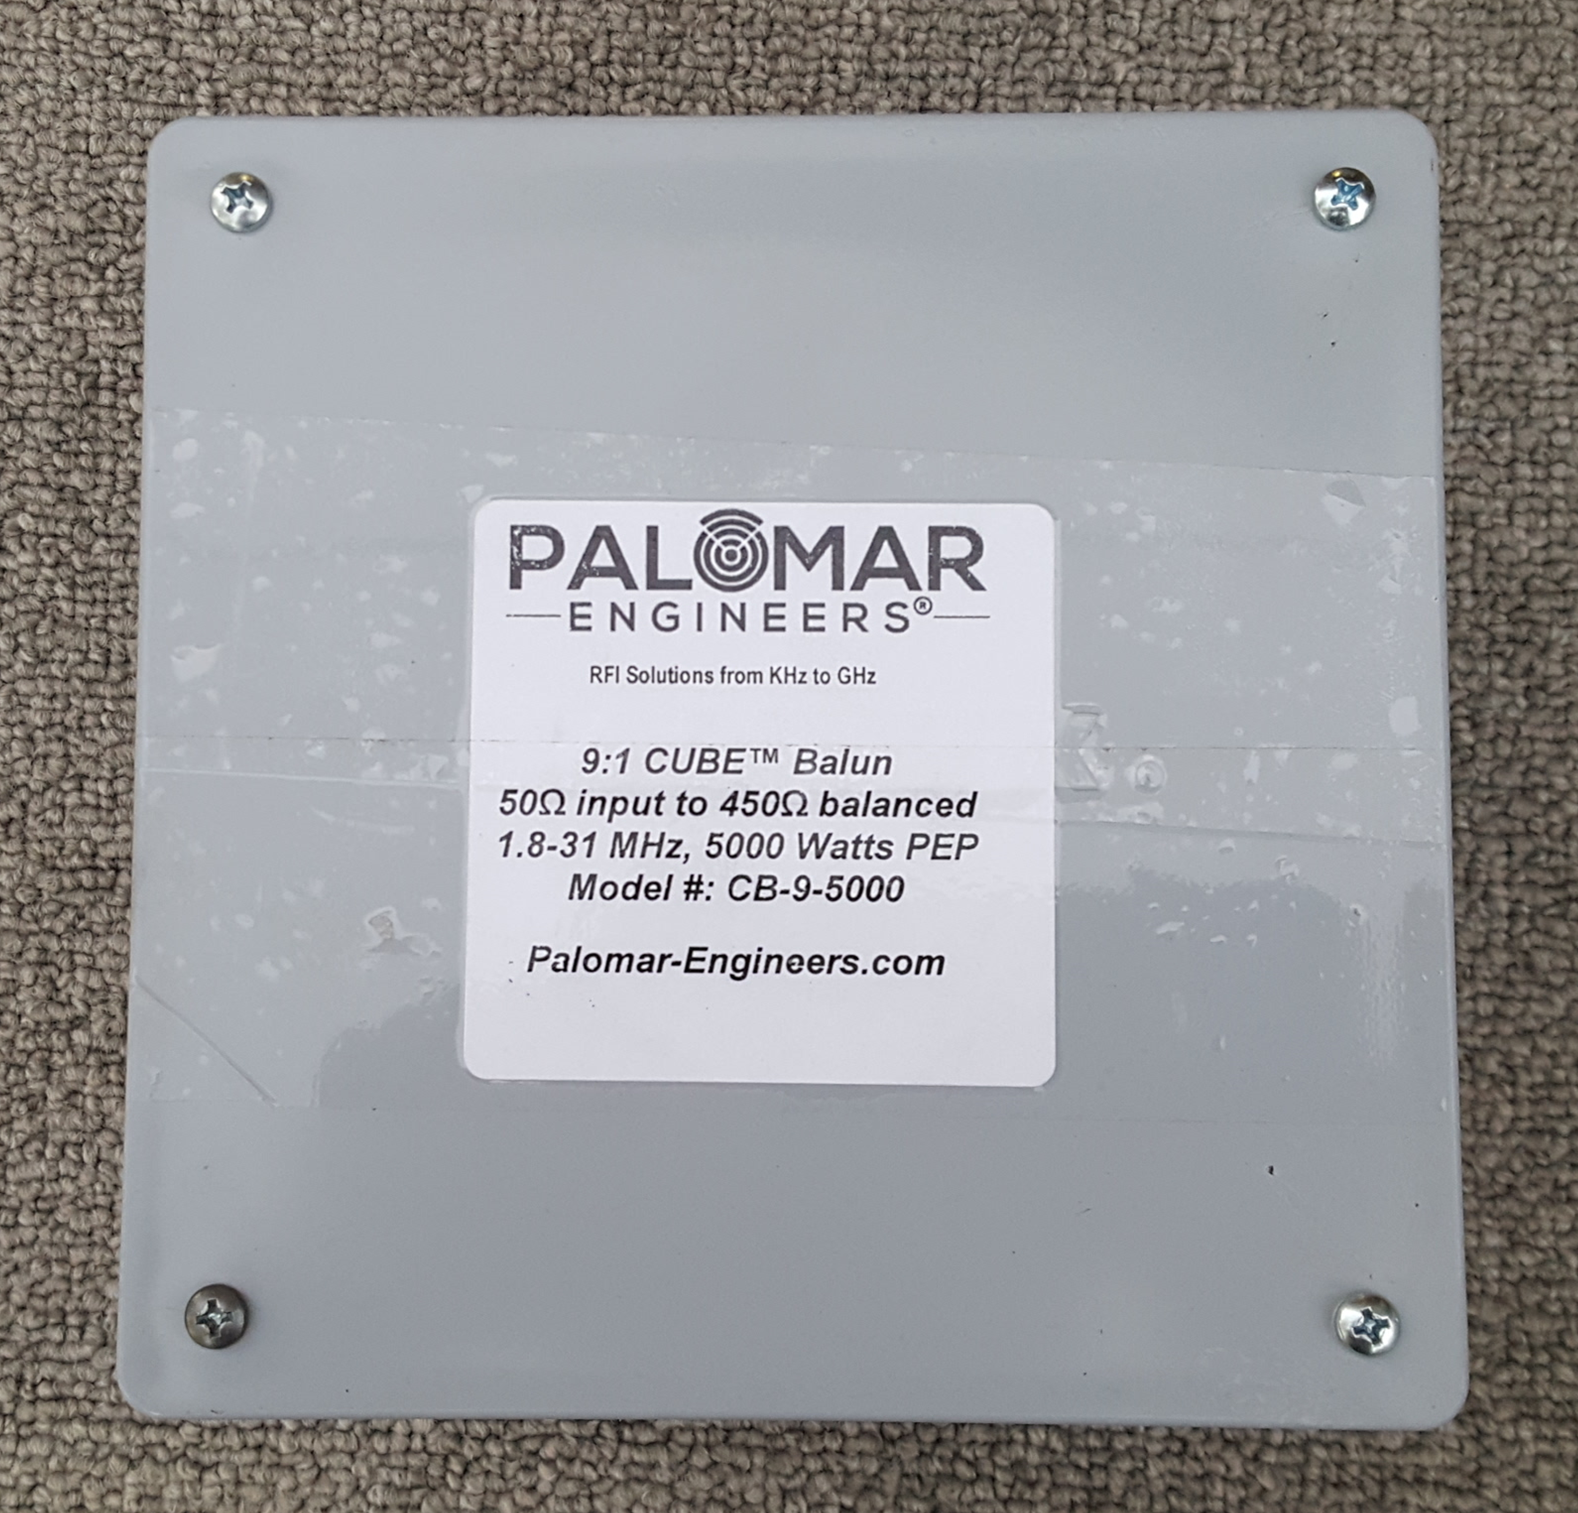 50:450 ohm (9:1) CUBE™ Balun, 1.8-31 MHz, 5 KW, ladder line, ZEPP, T2FD CB-9-5000TS